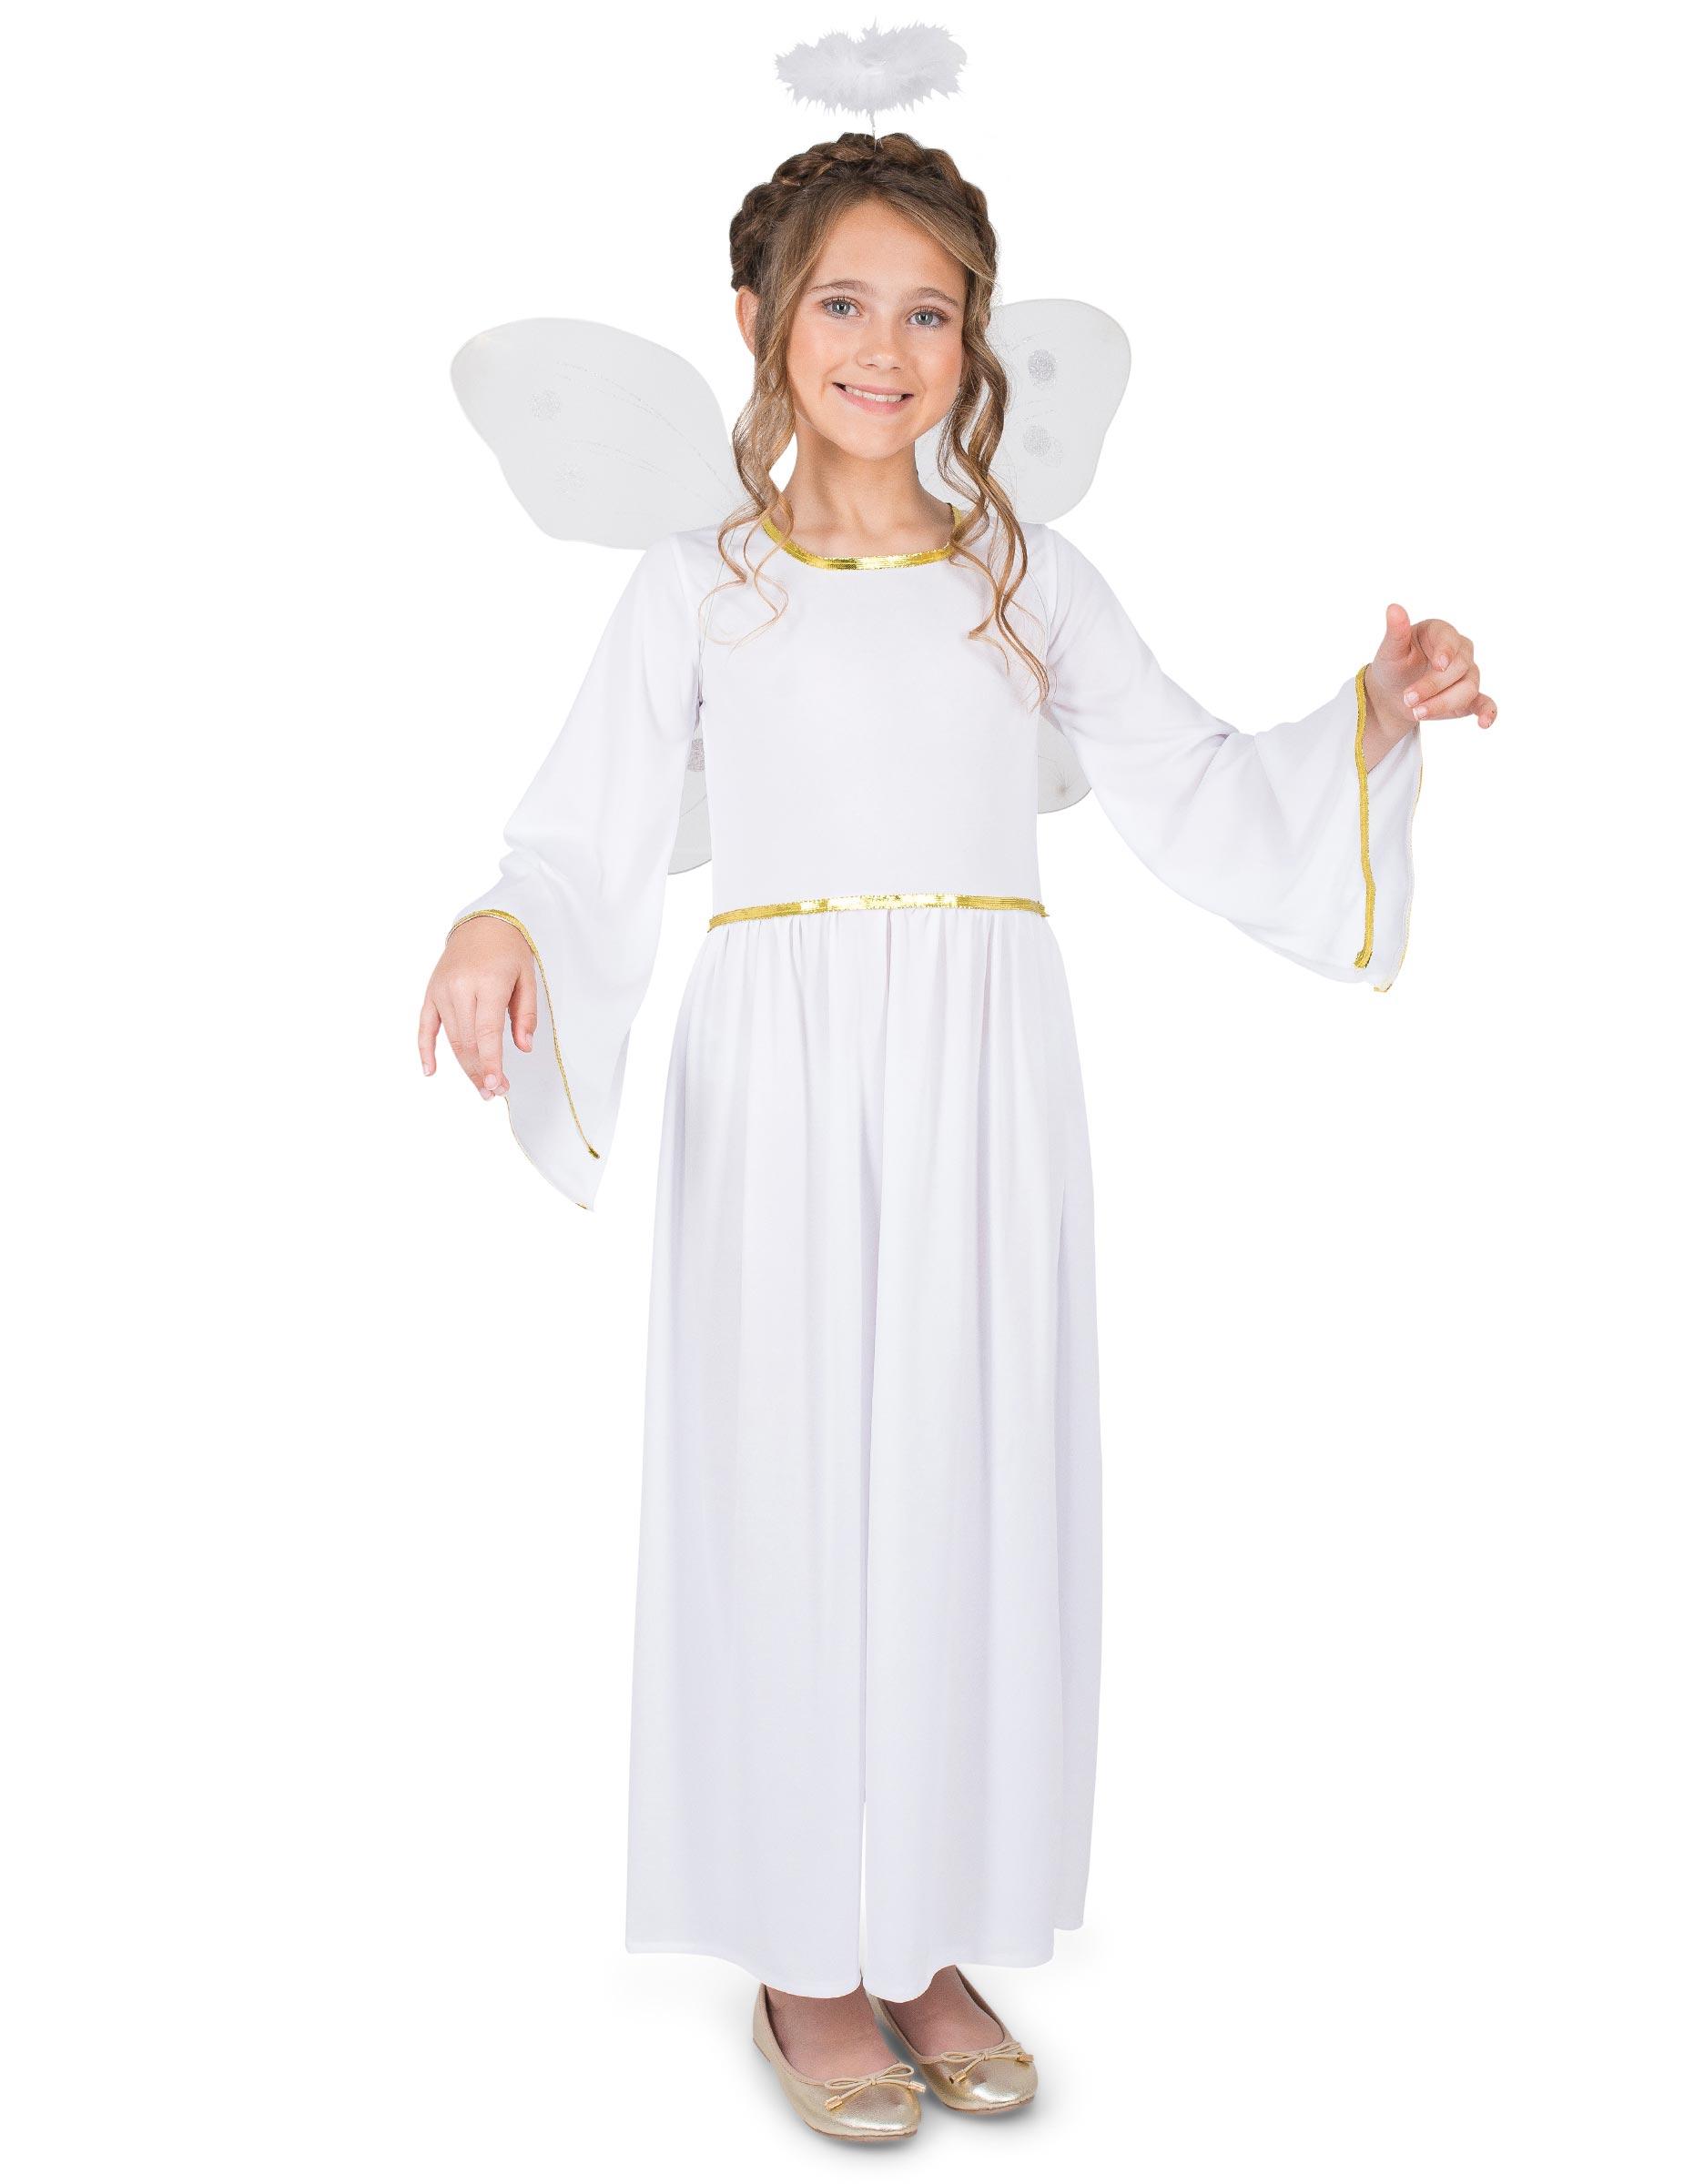 Disfraces de ngeles infantiles baratos de Vegaooes